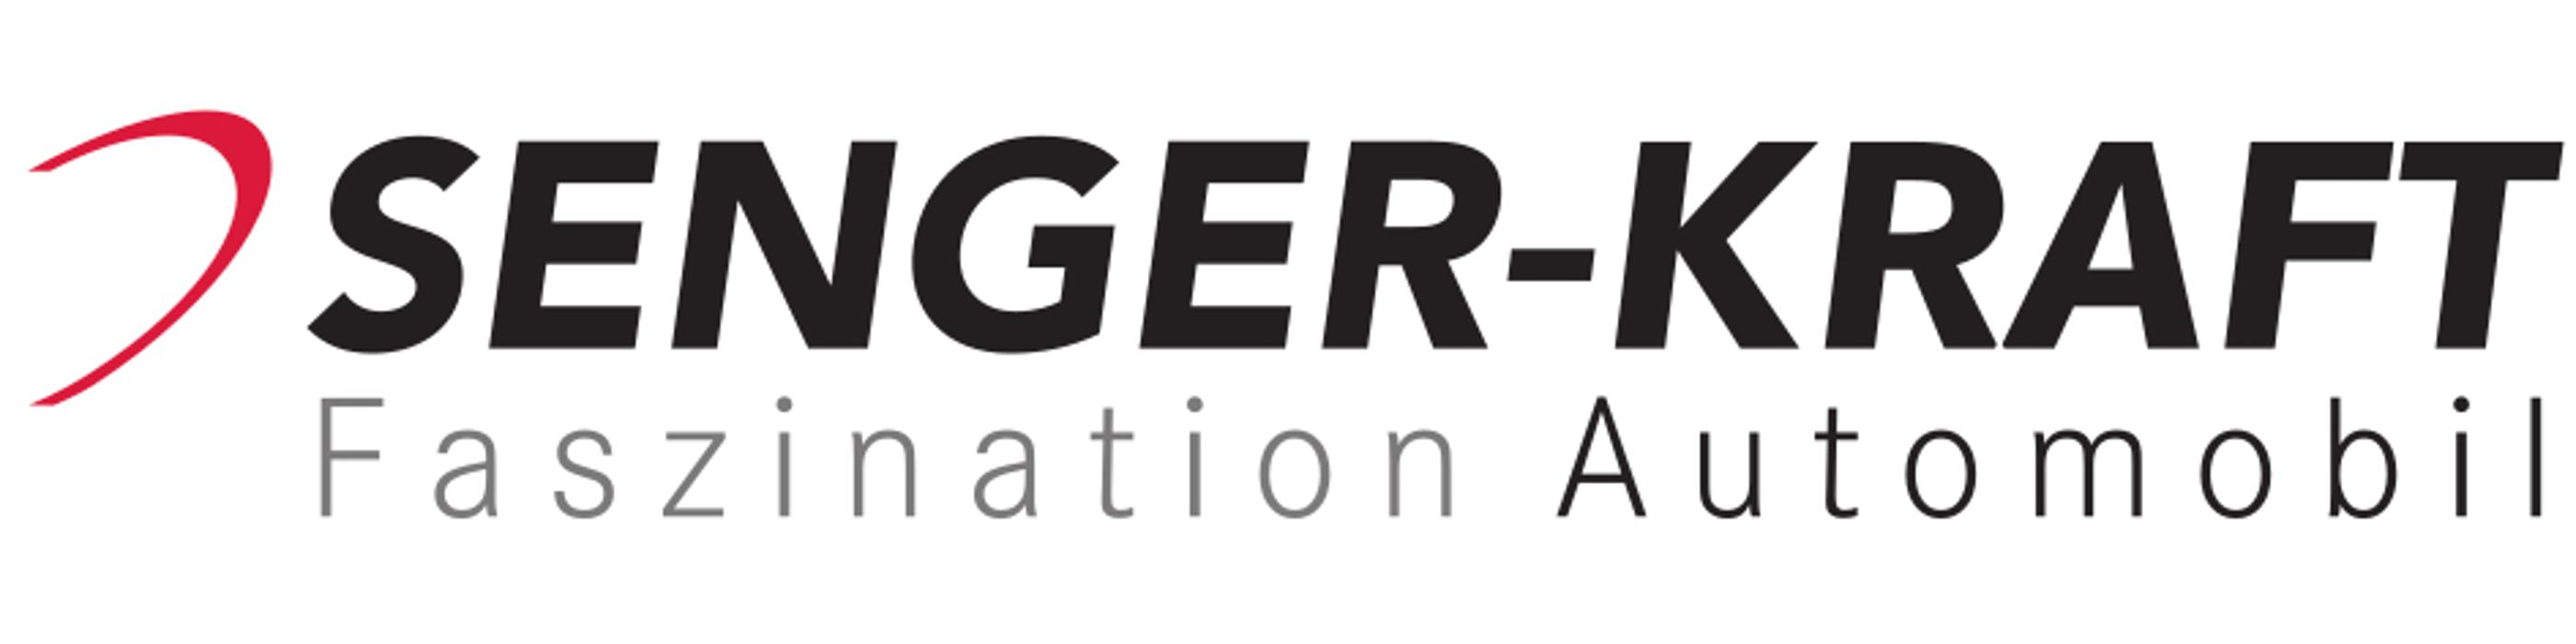 Logo von Senger-Kraft GmbH & Co. KG